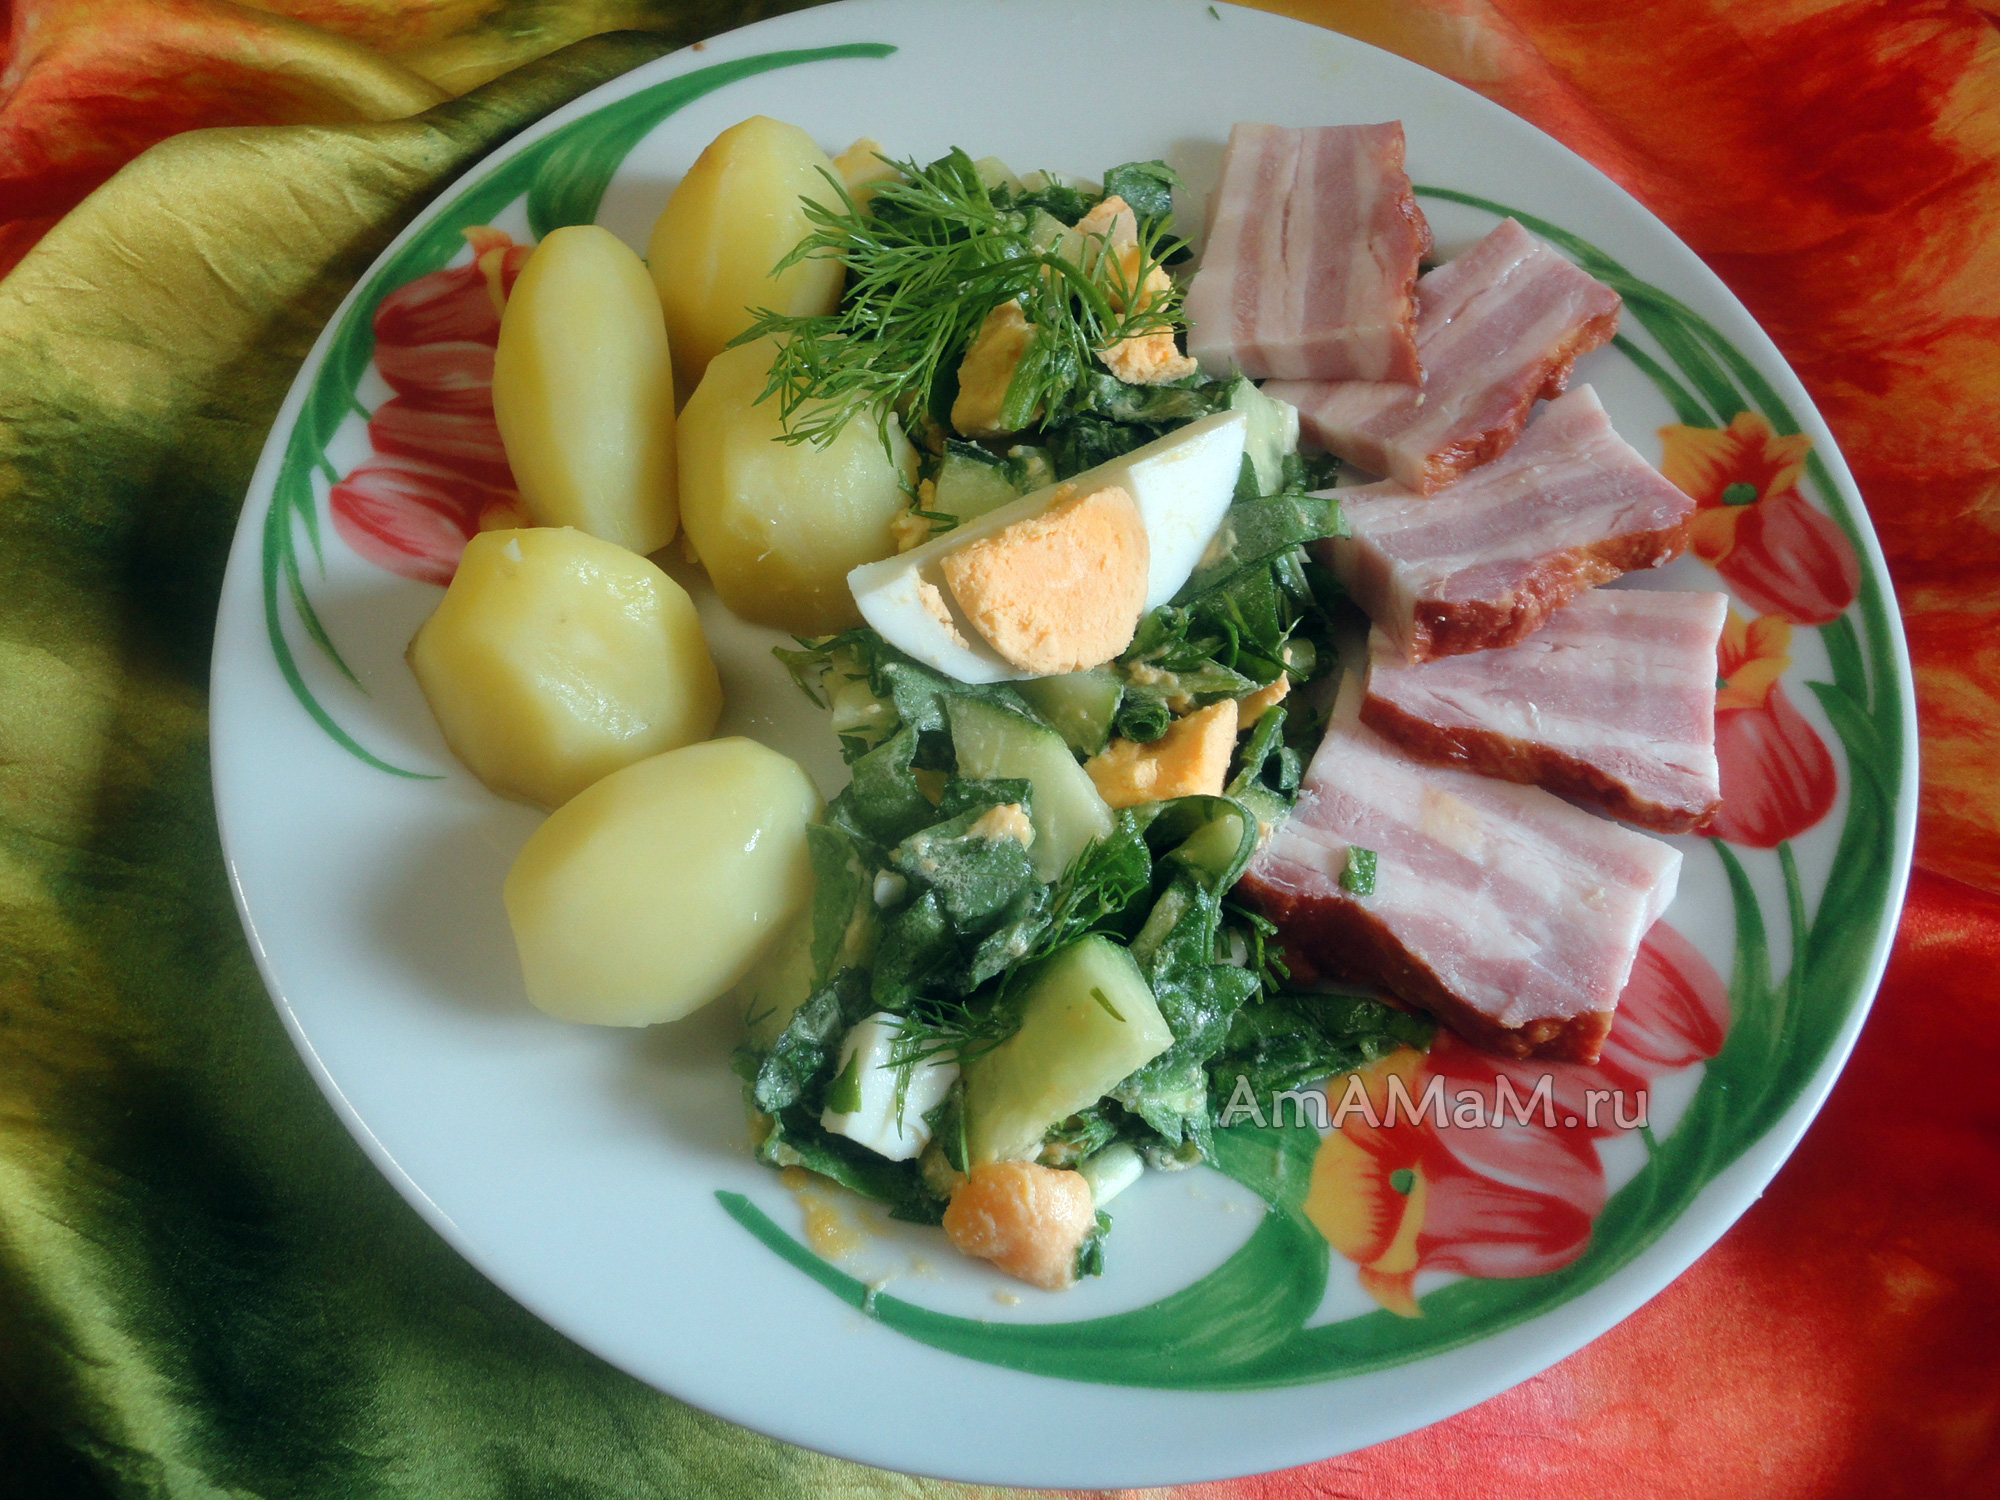 рецепты щавель яйцо вареное салат